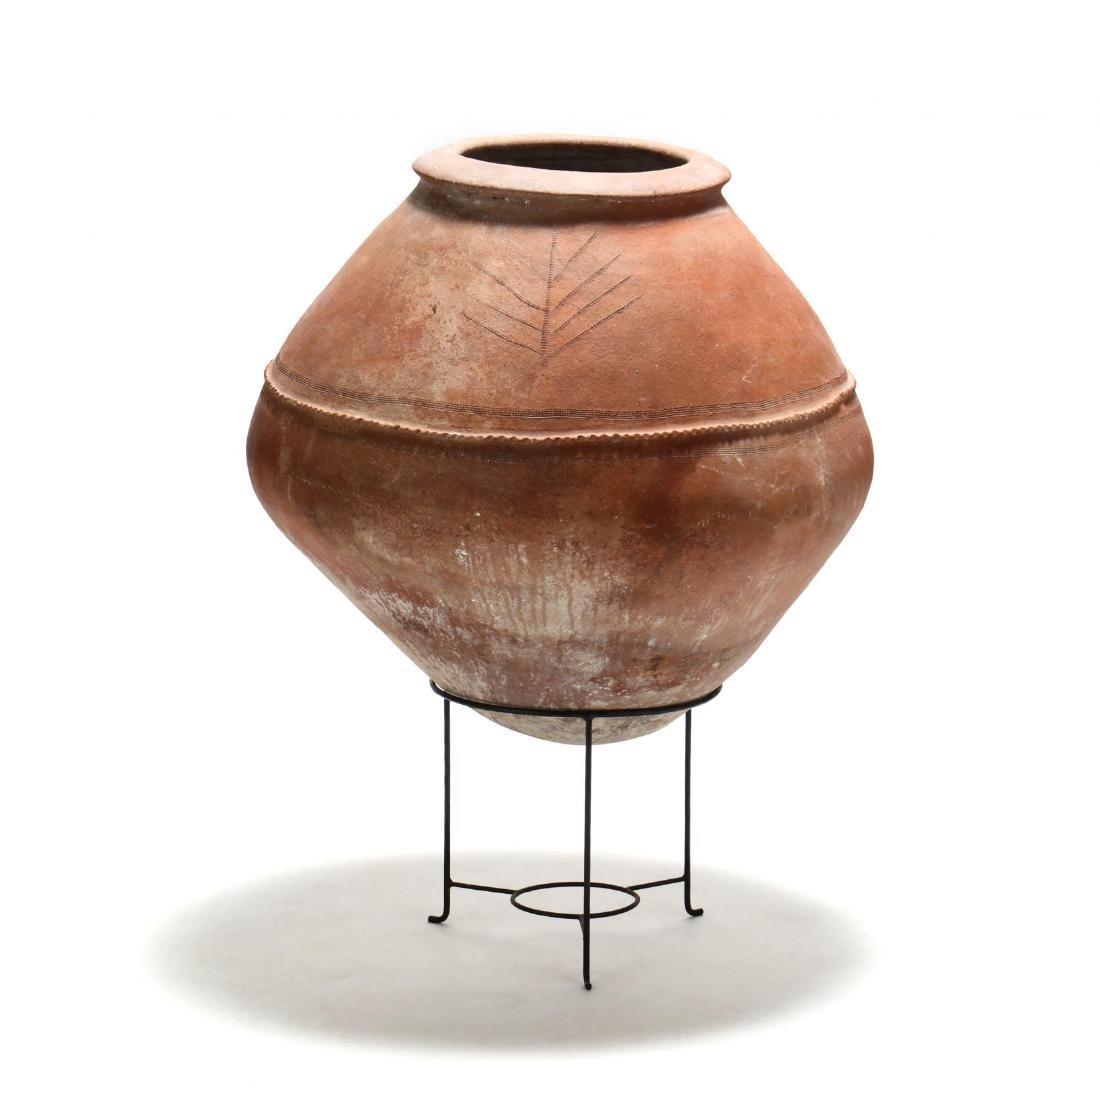 Cypriot Traditional Terracotta Storage Jar - 5